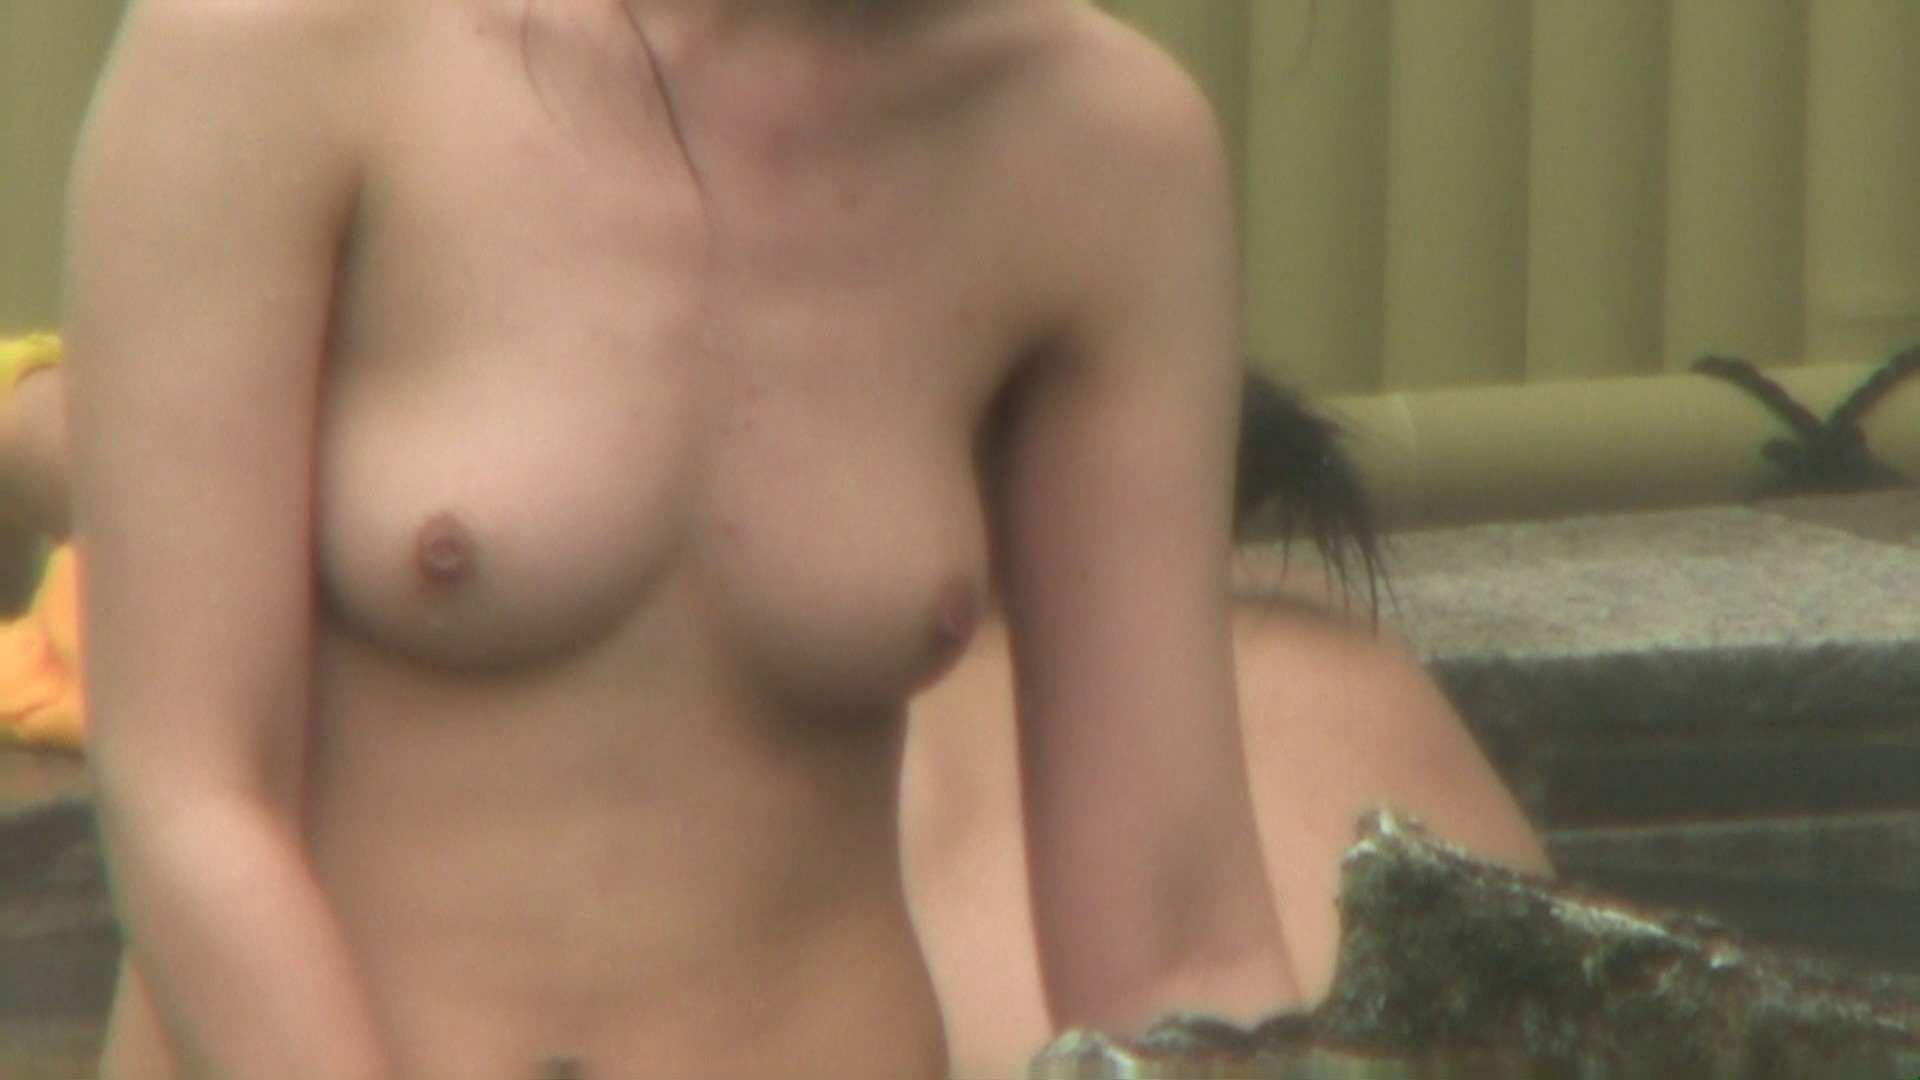 Aquaな露天風呂Vol.73【VIP限定】 盗撮 | HなOL  54pic 30